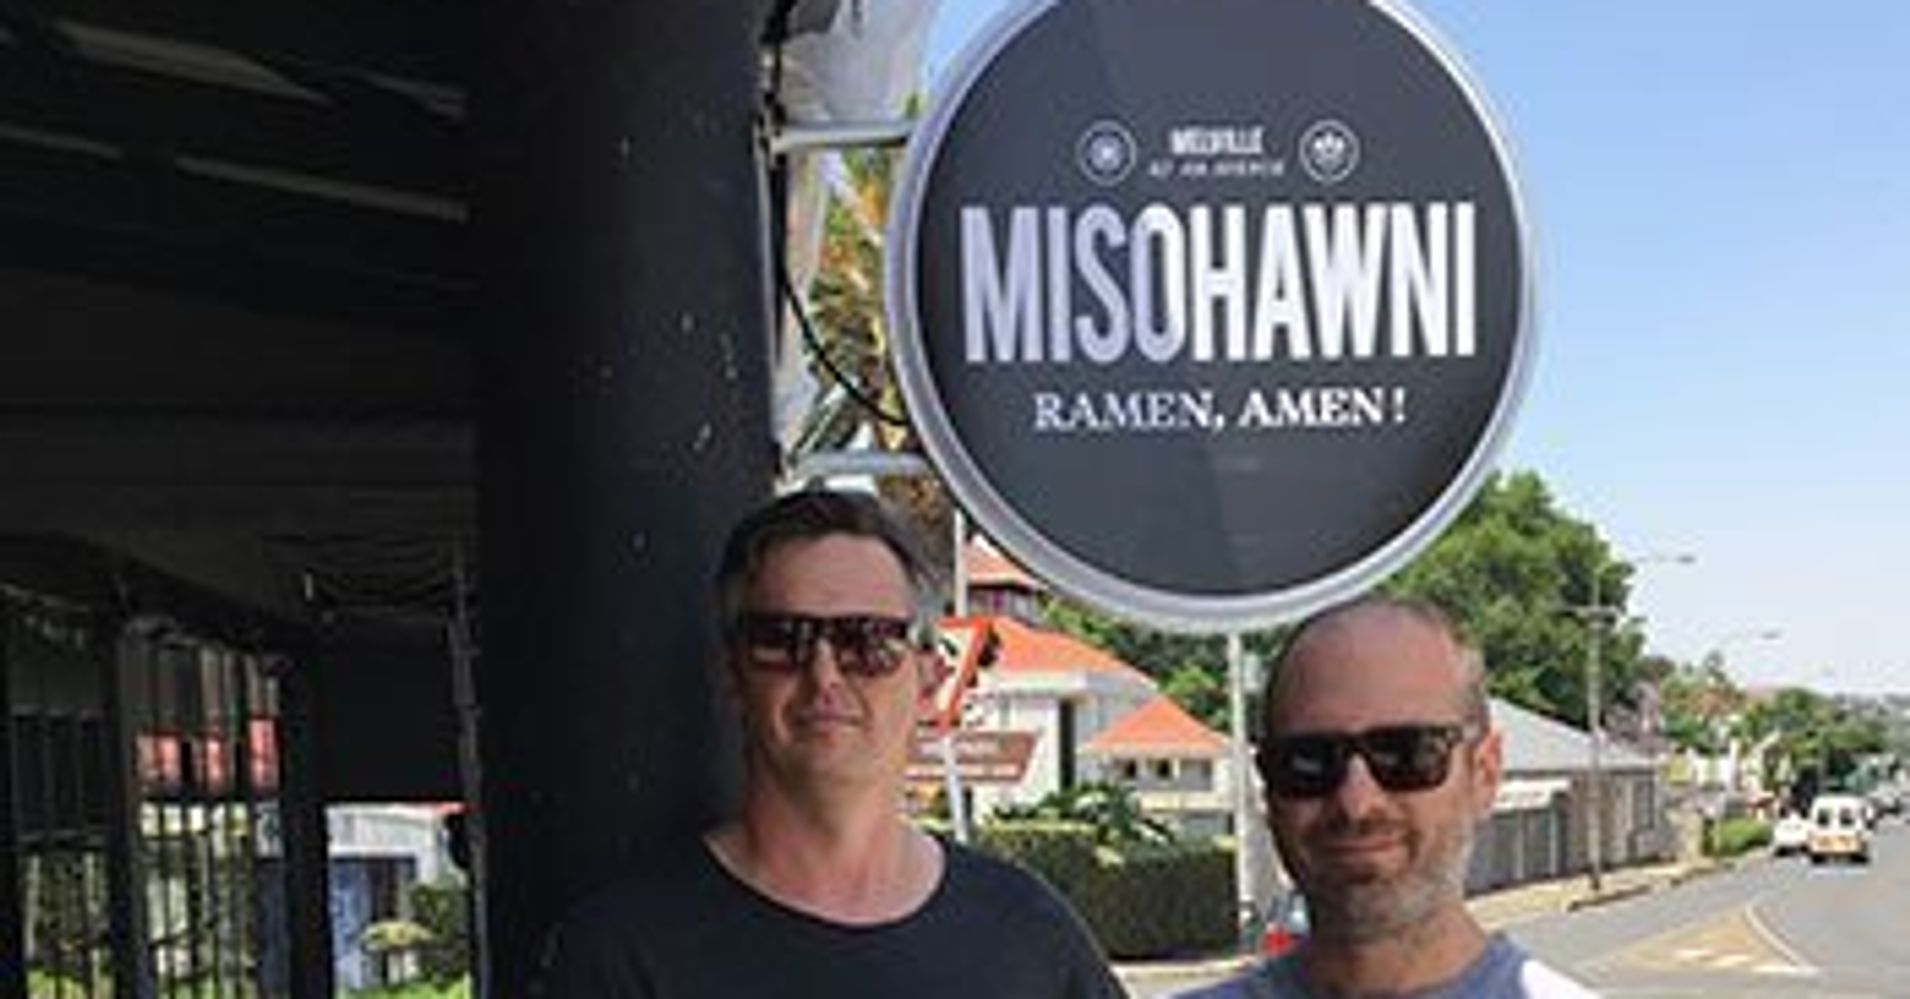 White Owners Apologize After Naming Asian Fusion Restaurant 'Misohawni'